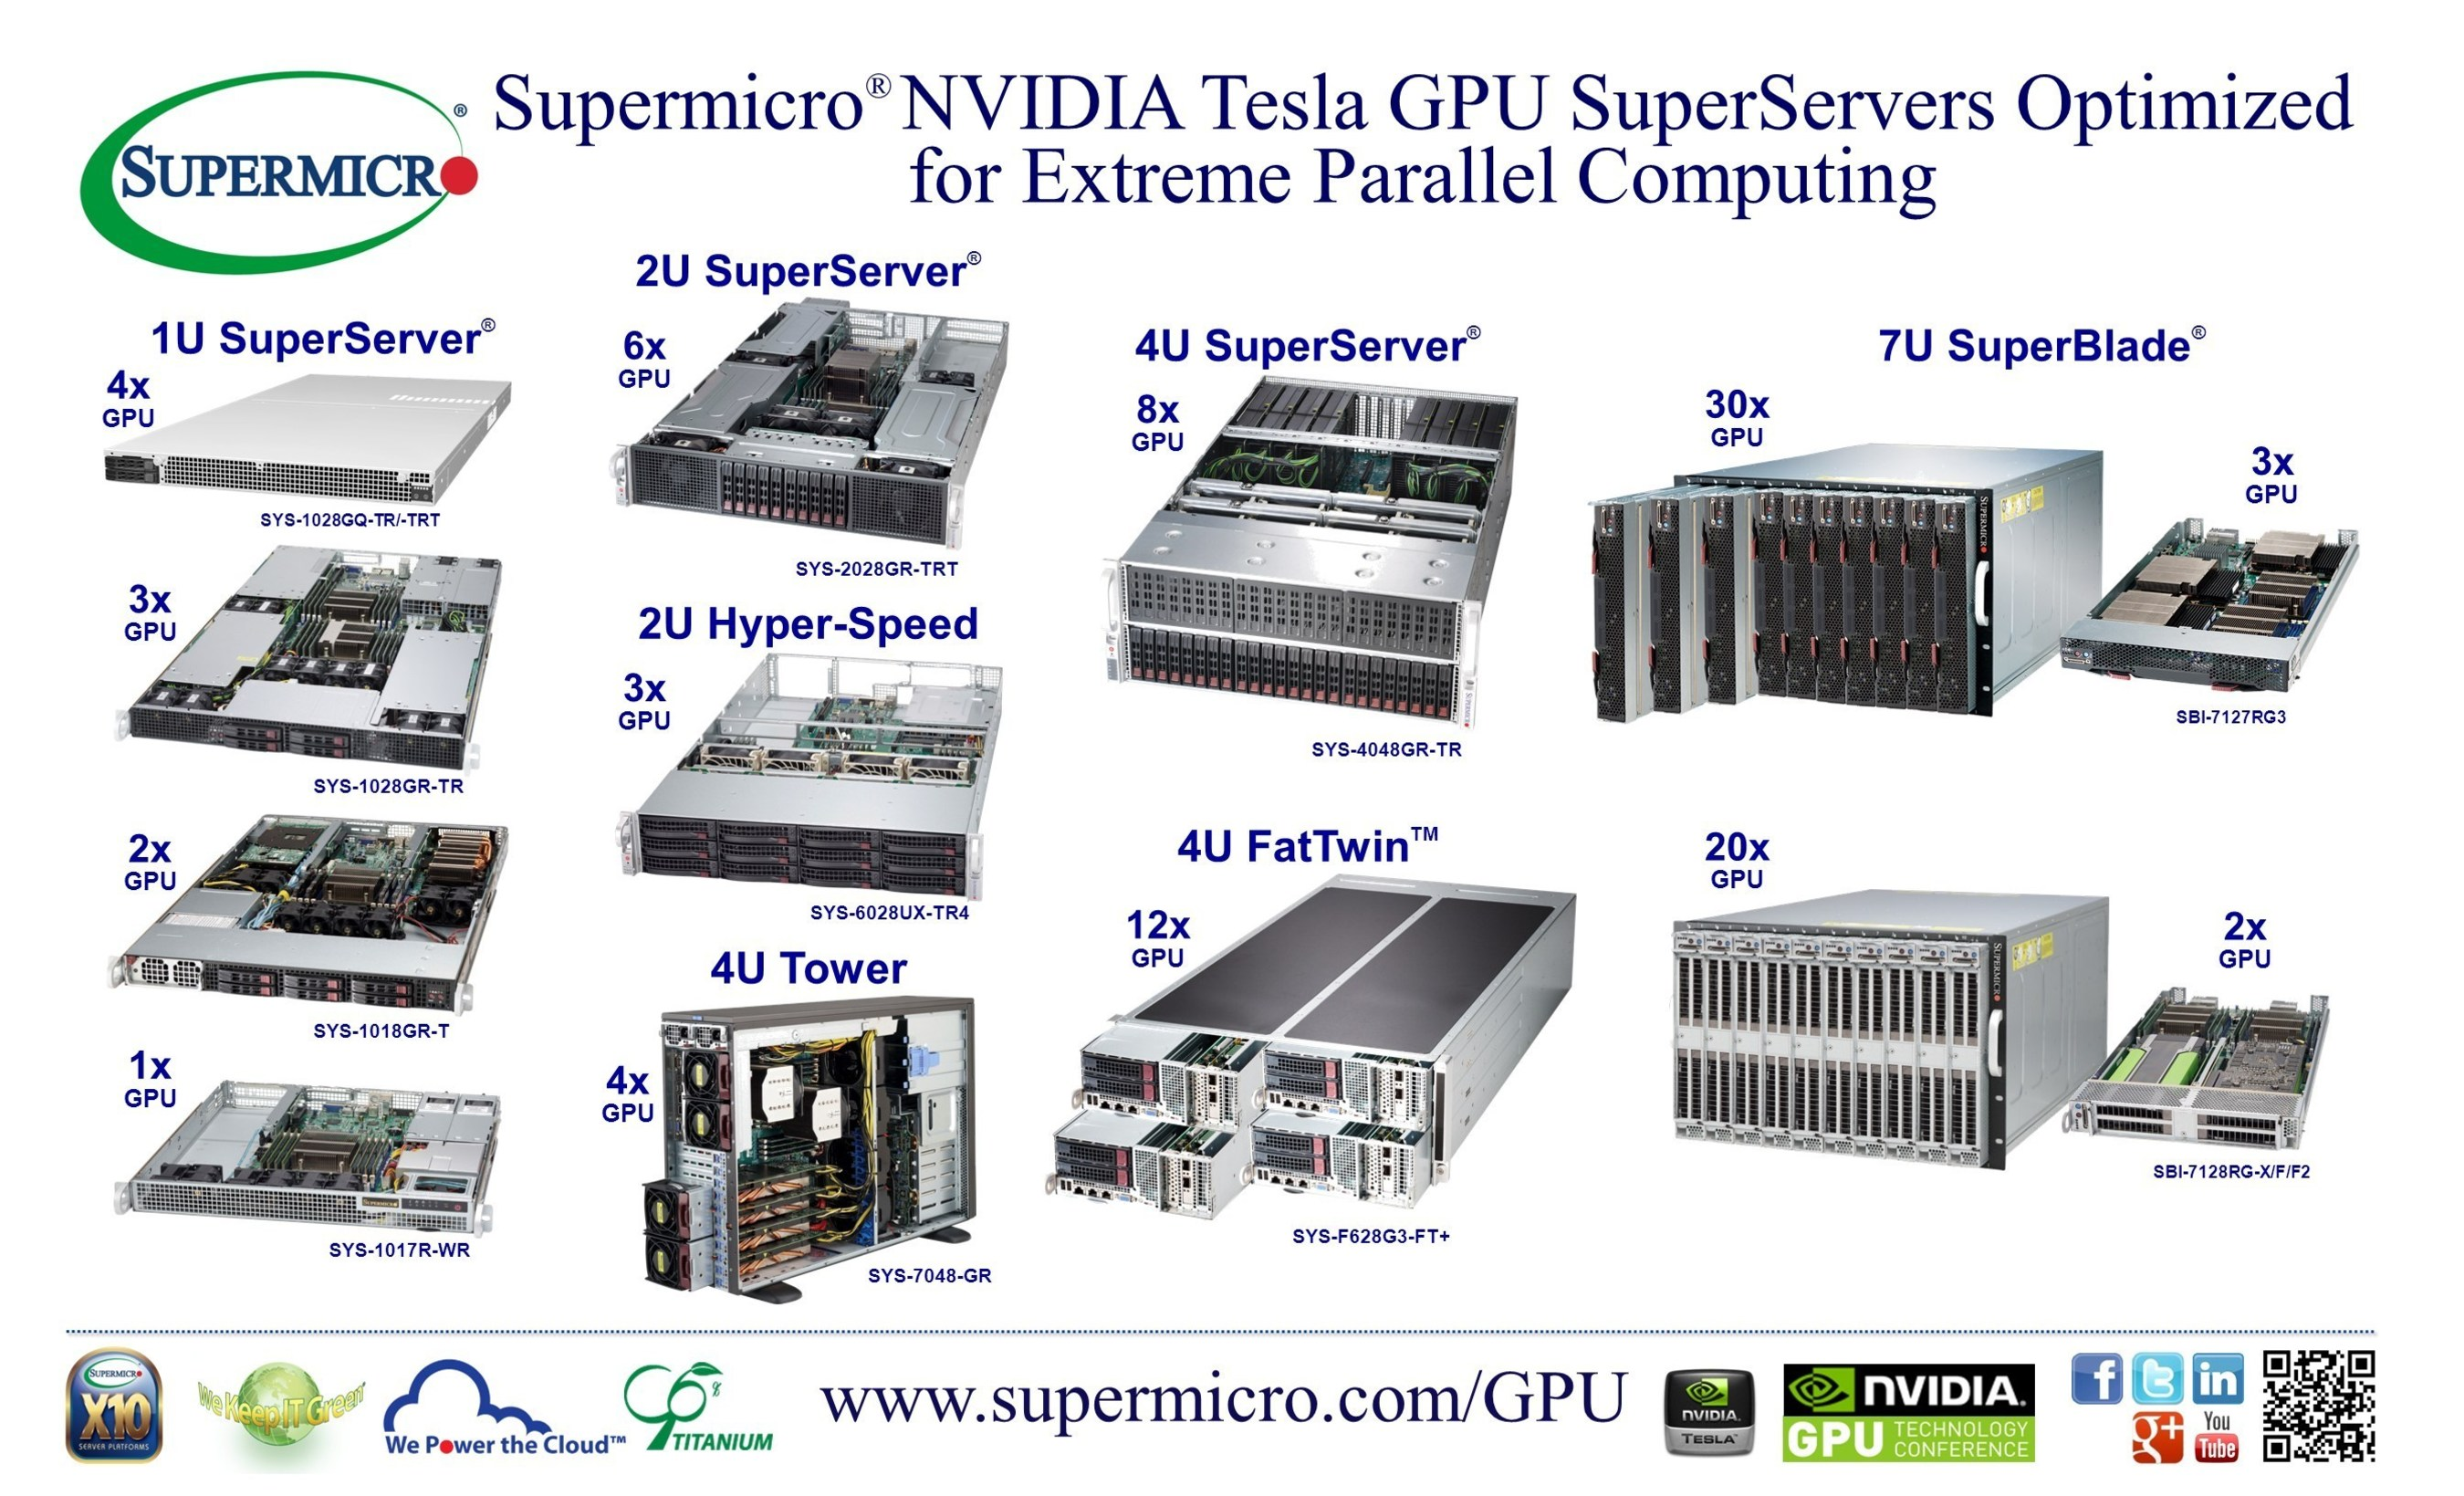 Supermicro® presenta i nuovi SuperServer GPU NVIDIA Tesla ottimizzati per elevate capacità di